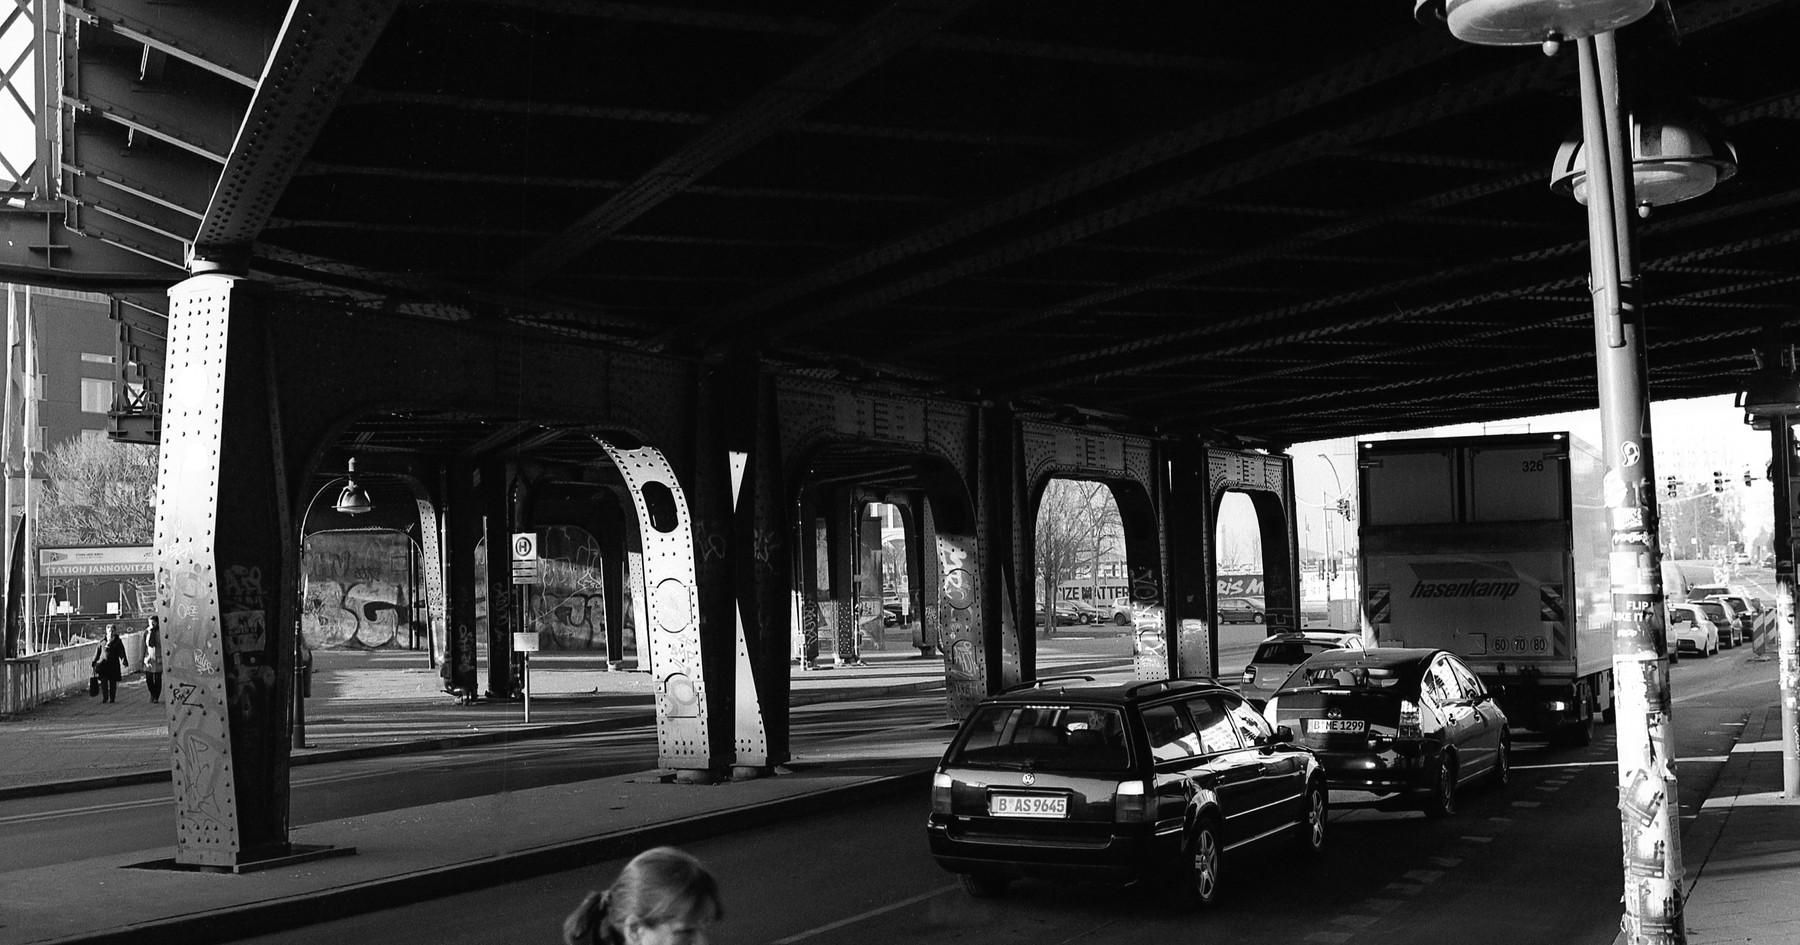 Woman under a Bridge, 2017